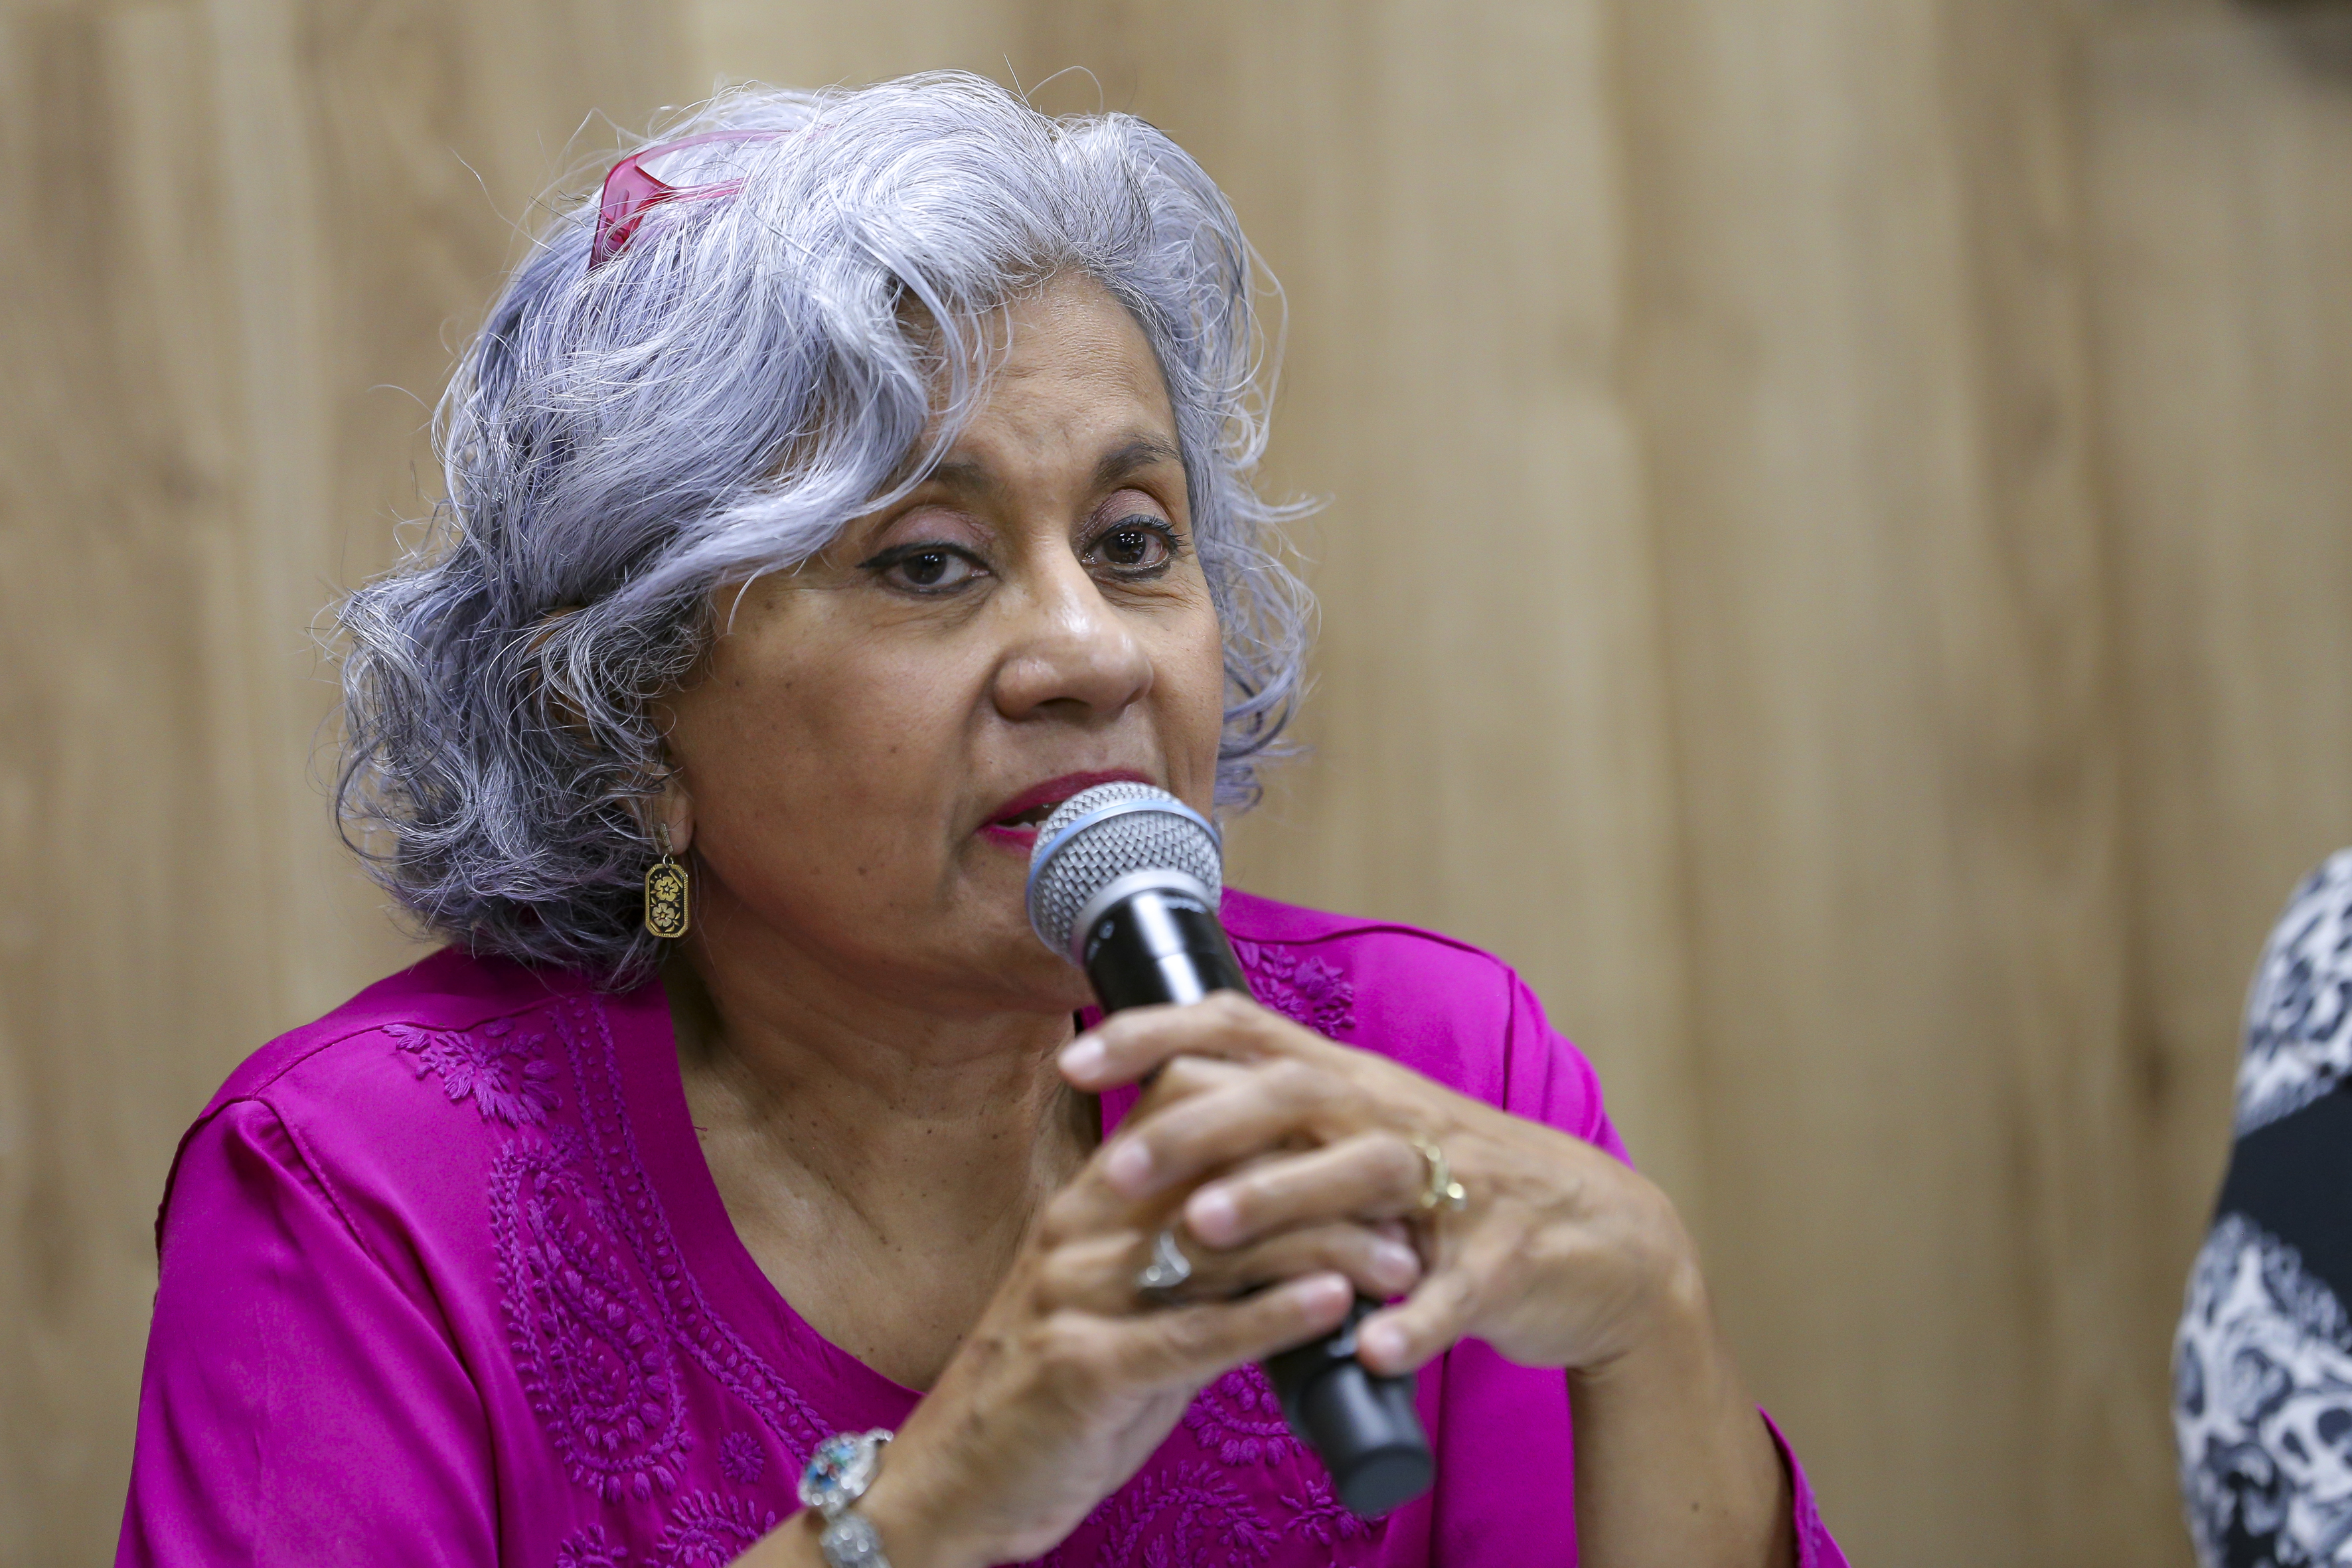 Dra. Irma Valadez al micrófono